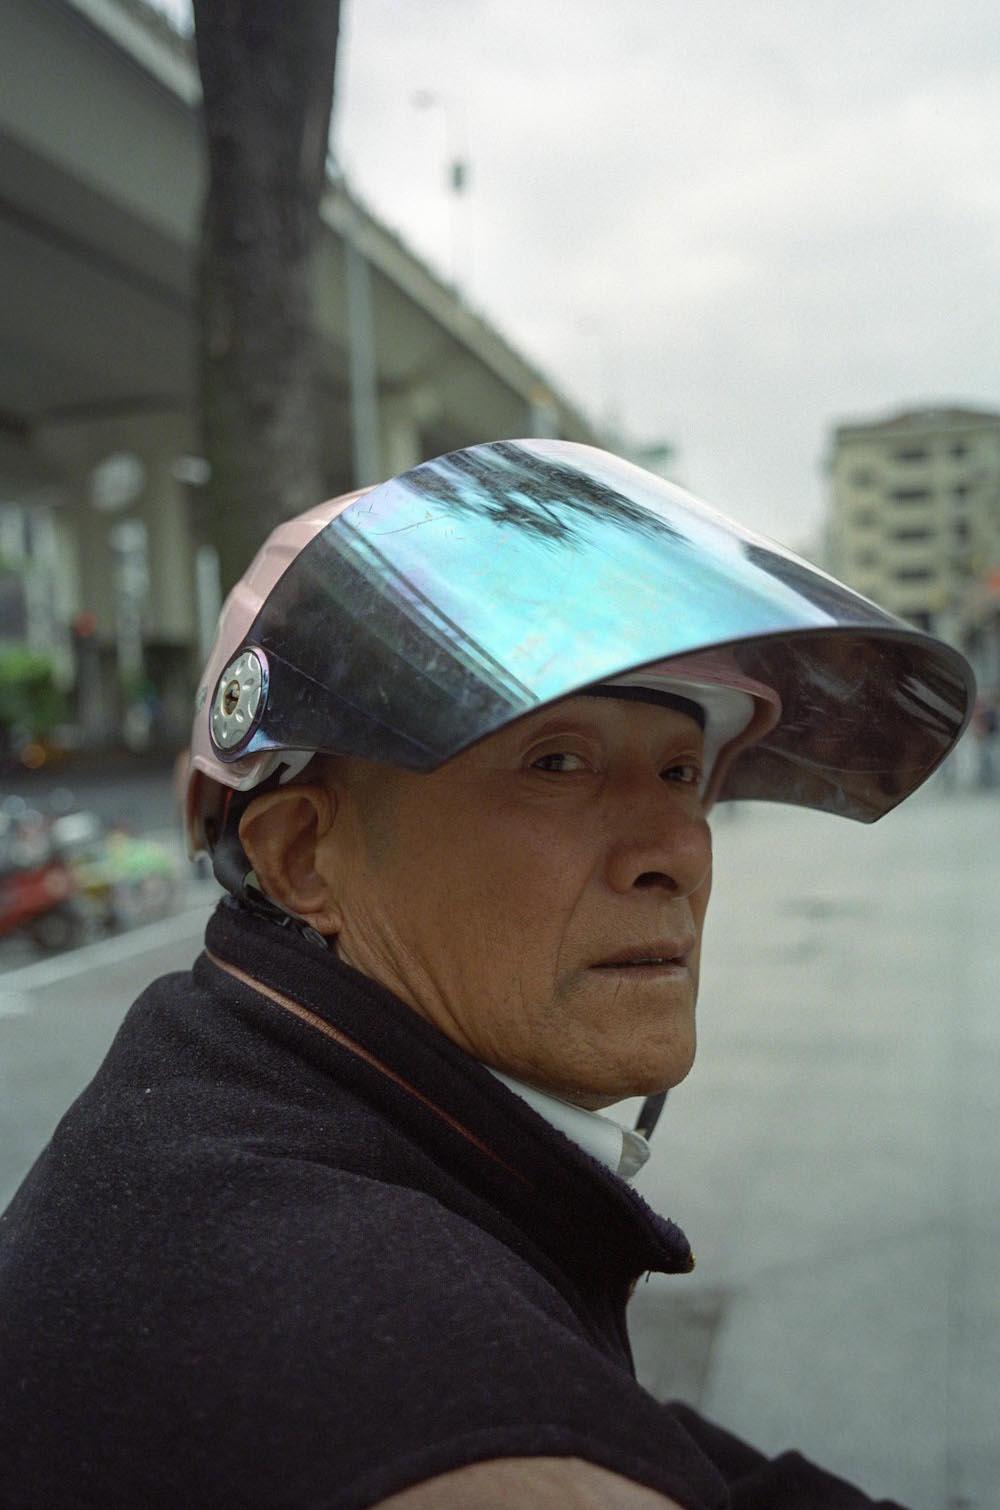 duran-levinson-shanghai-photography-8.jpg